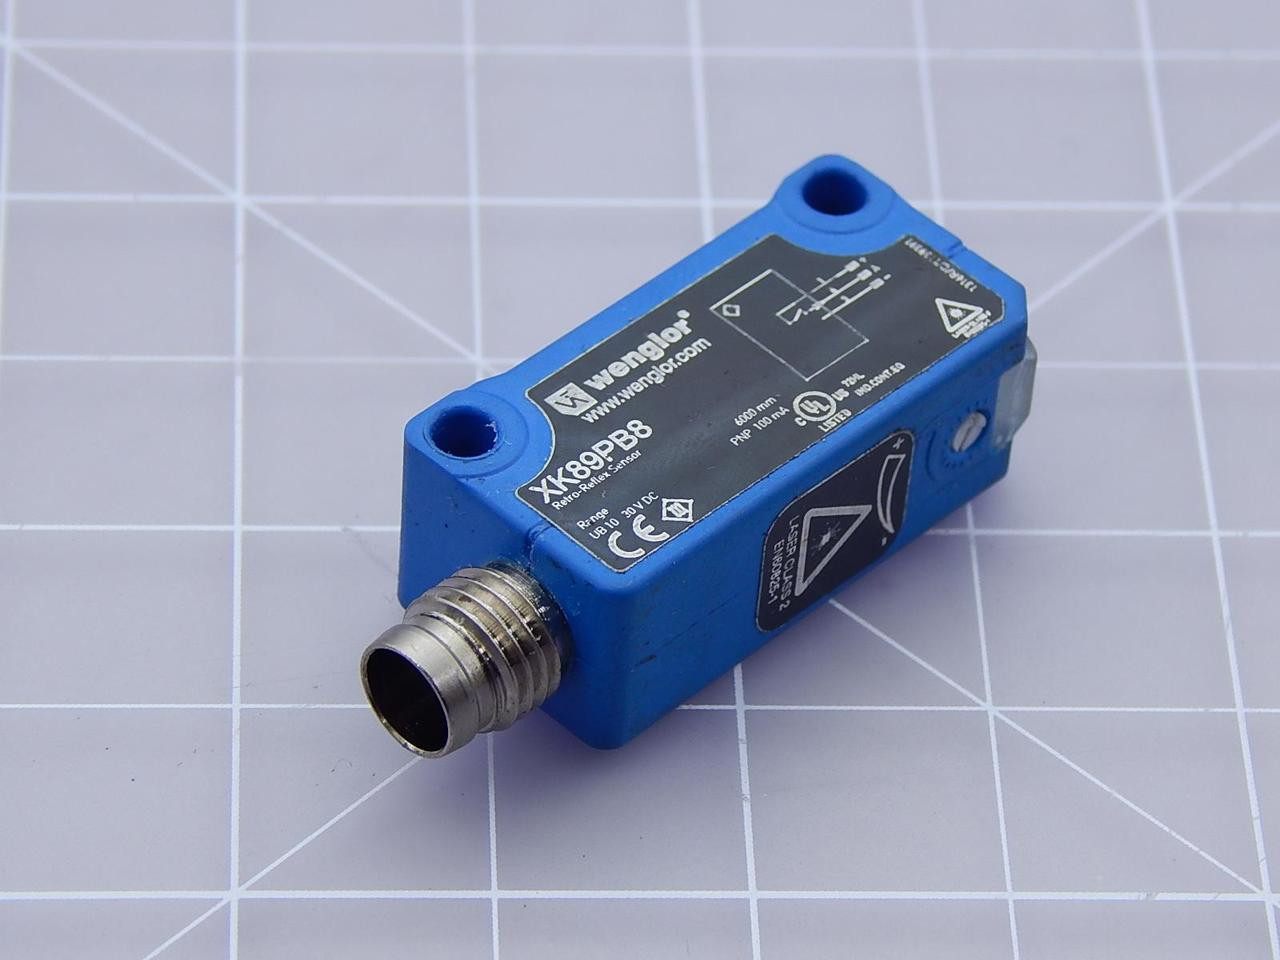 Retro-REFLEX sensore WENGLOR LK89PA7